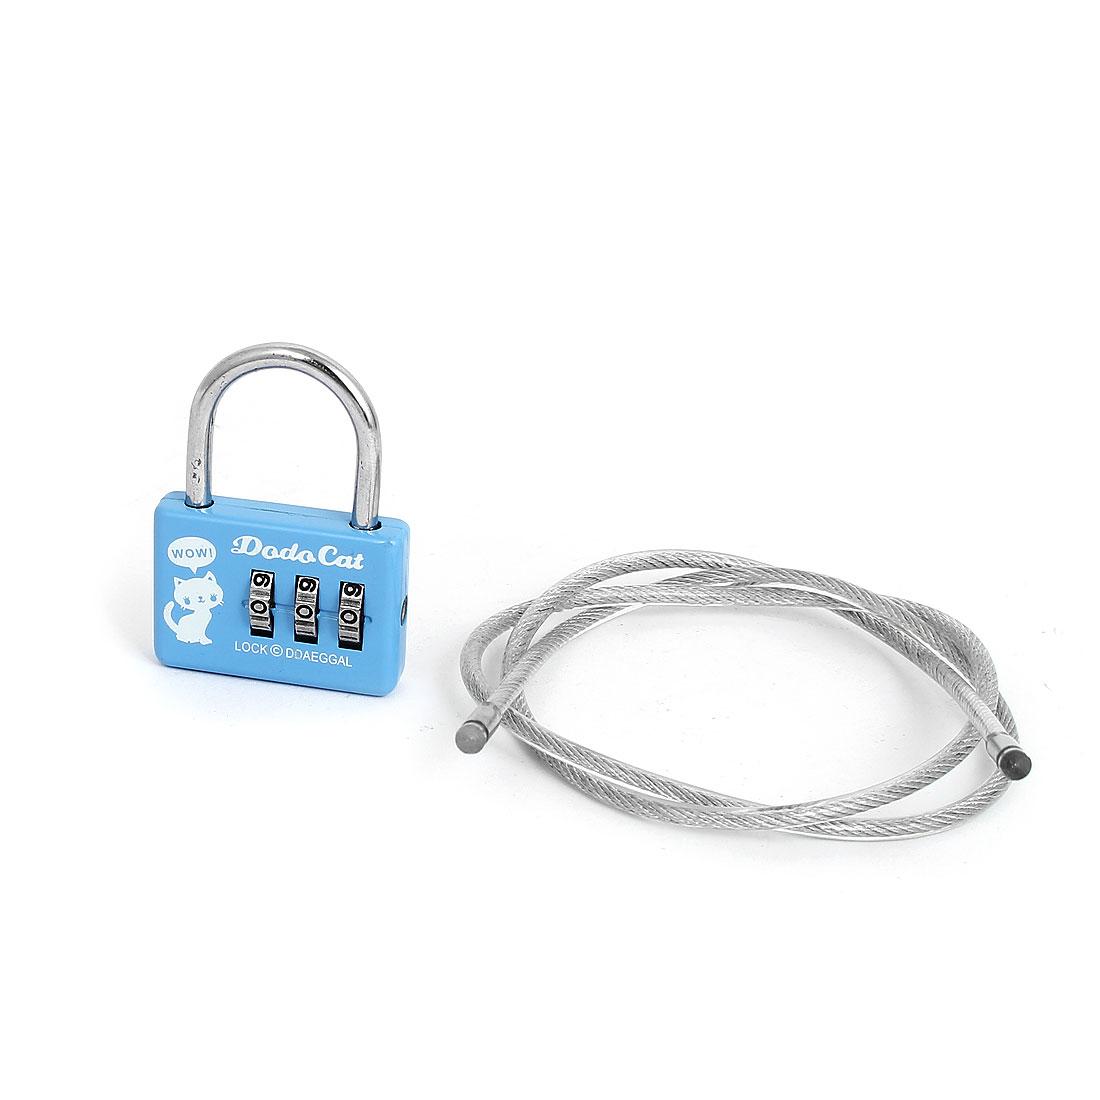 Mini 3 Digit Combination Security Safe Travel Luggage Code Lock Padlock